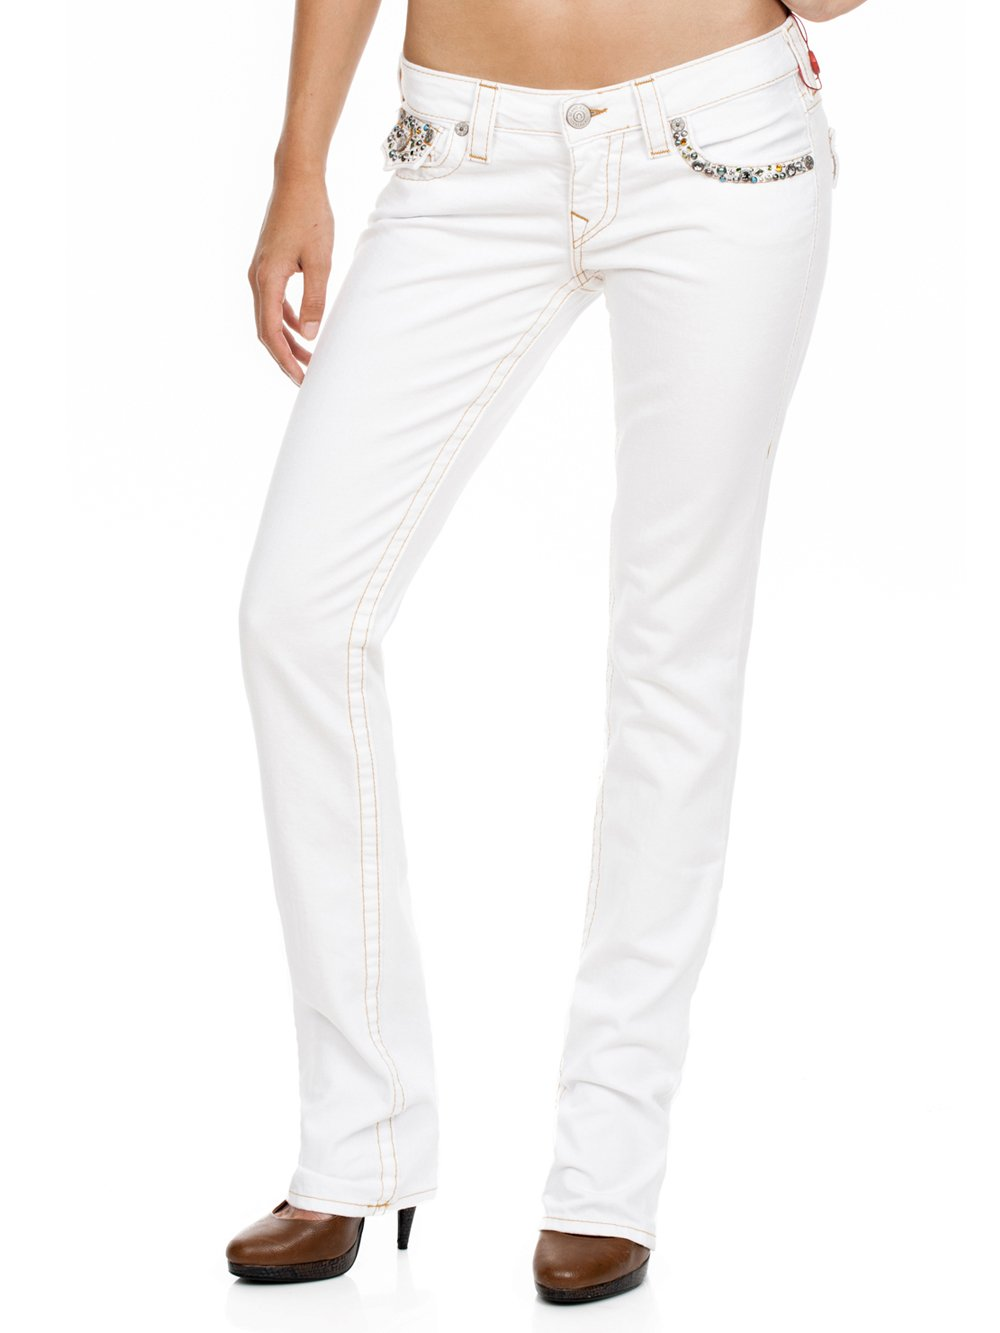 True Religion Damen Online Shop   Jeans der Hollywood Stars